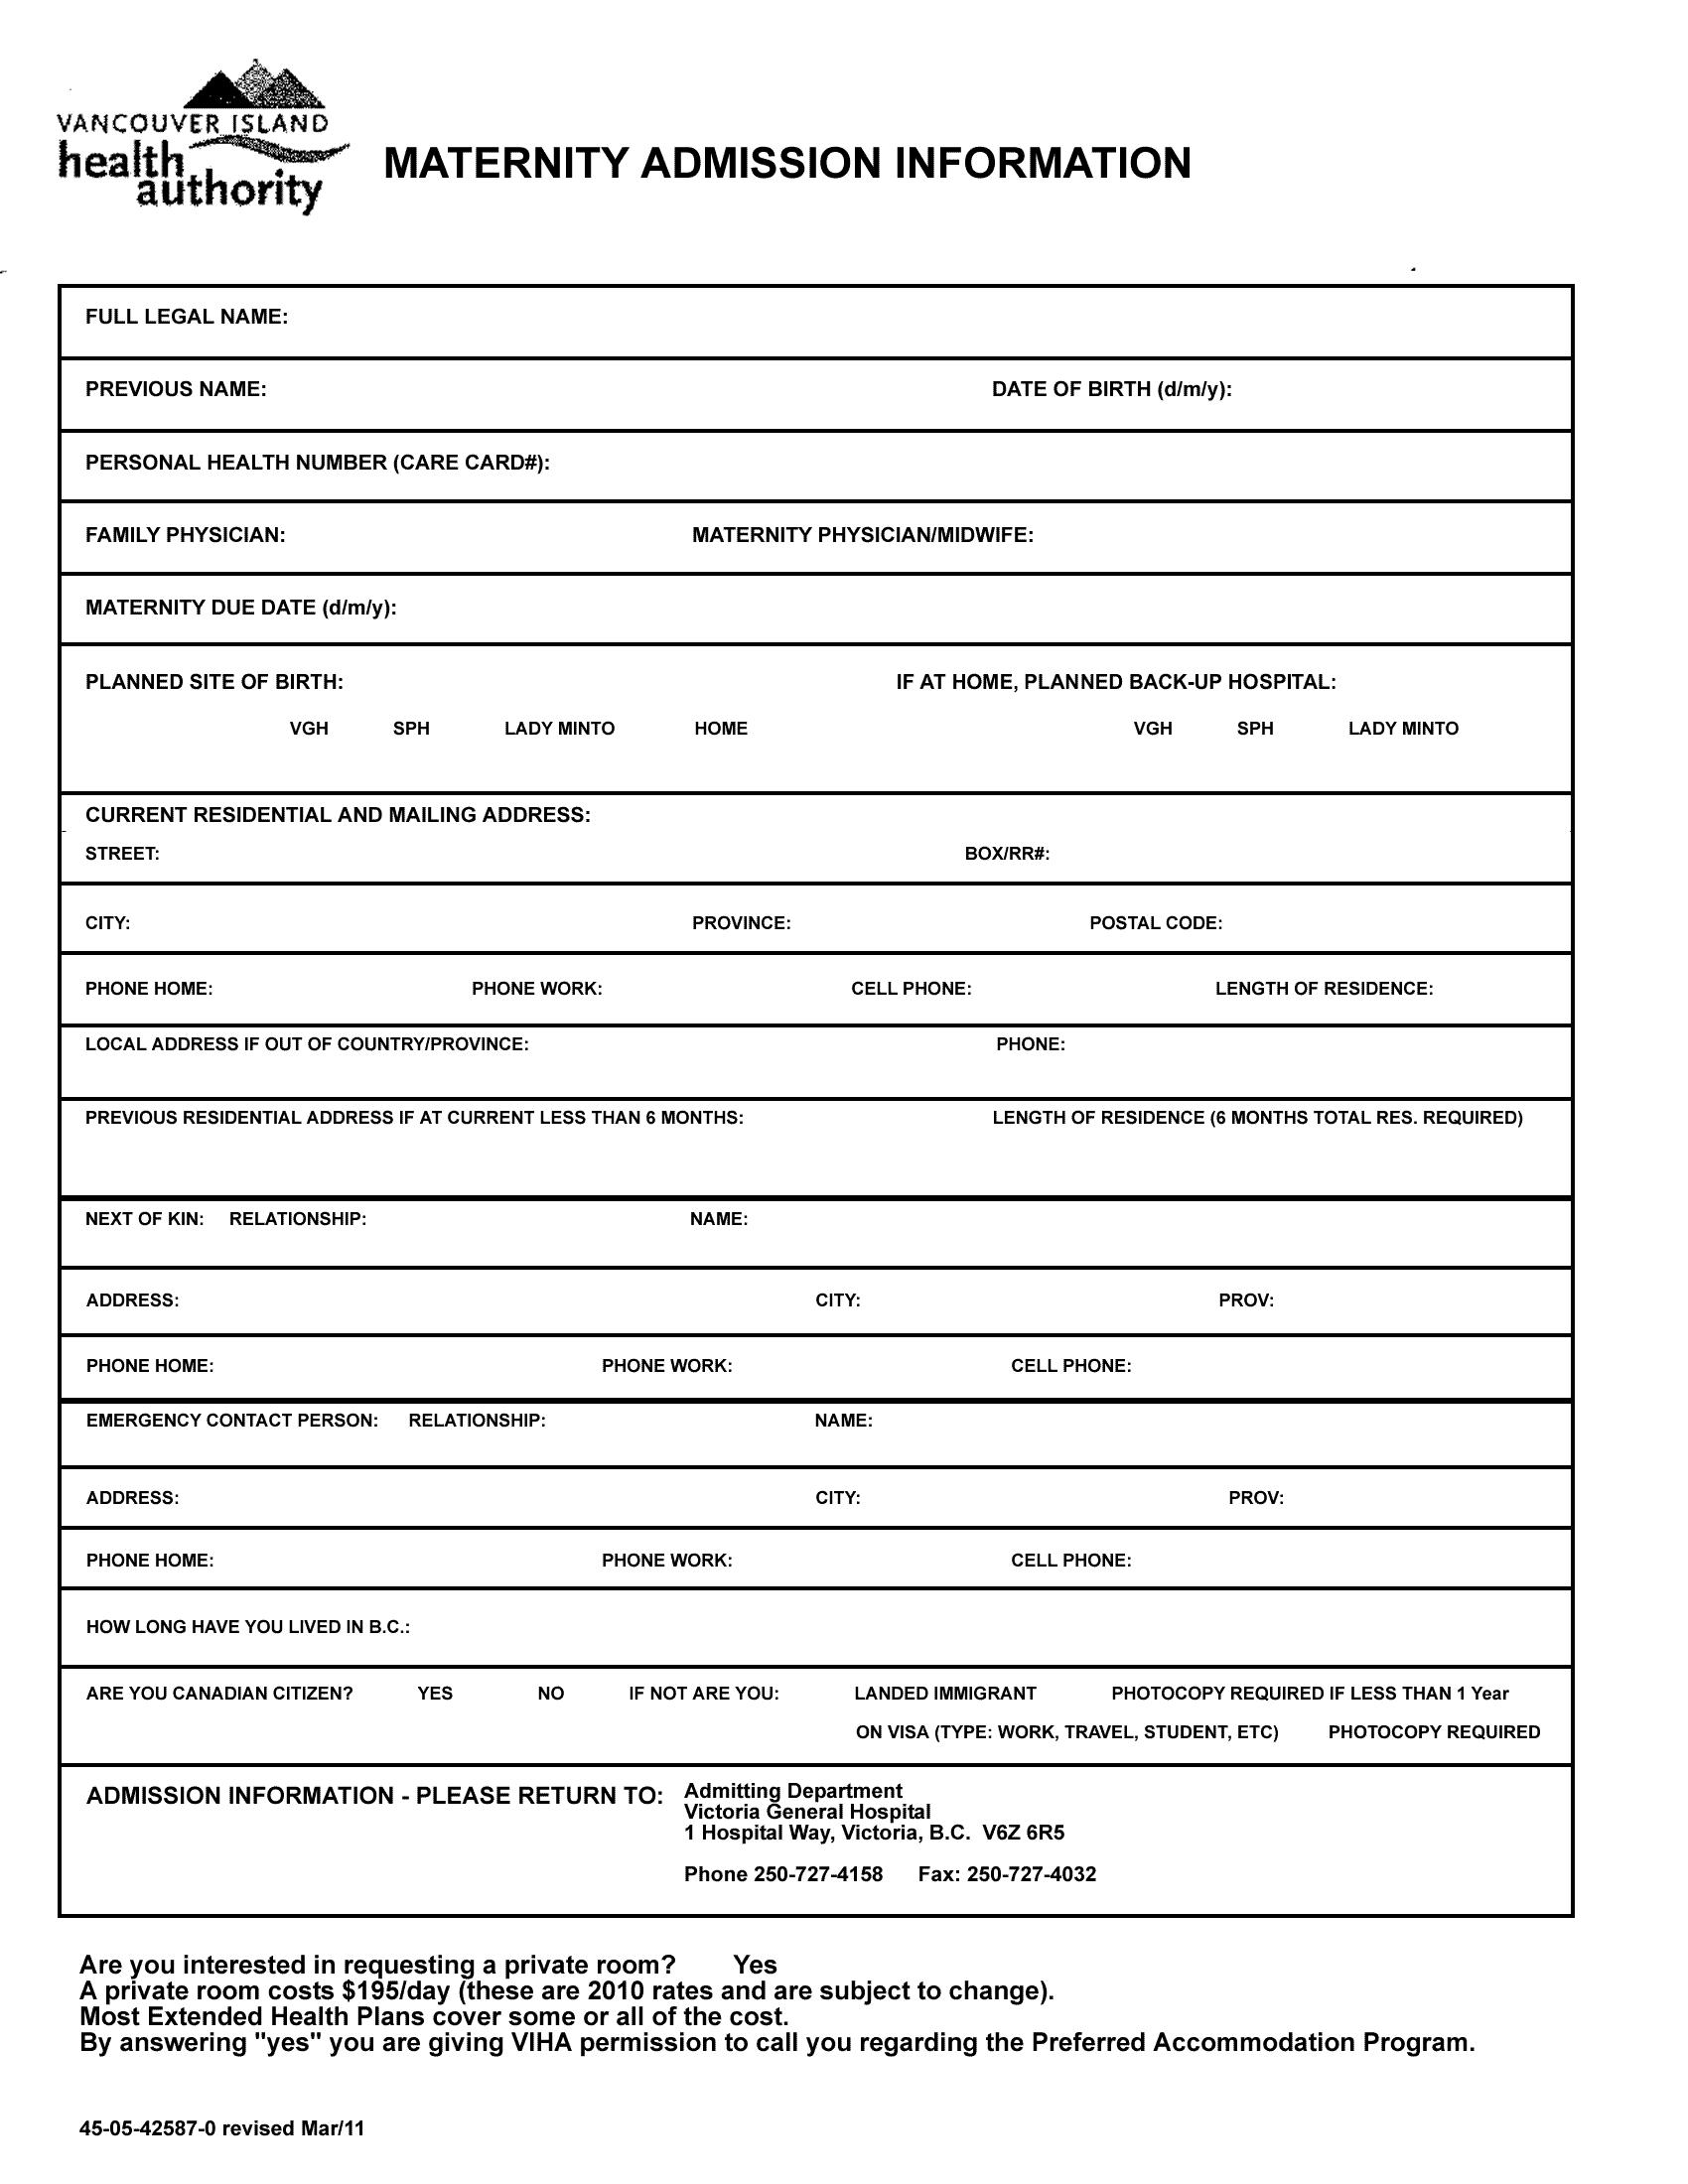 hospital admission form template